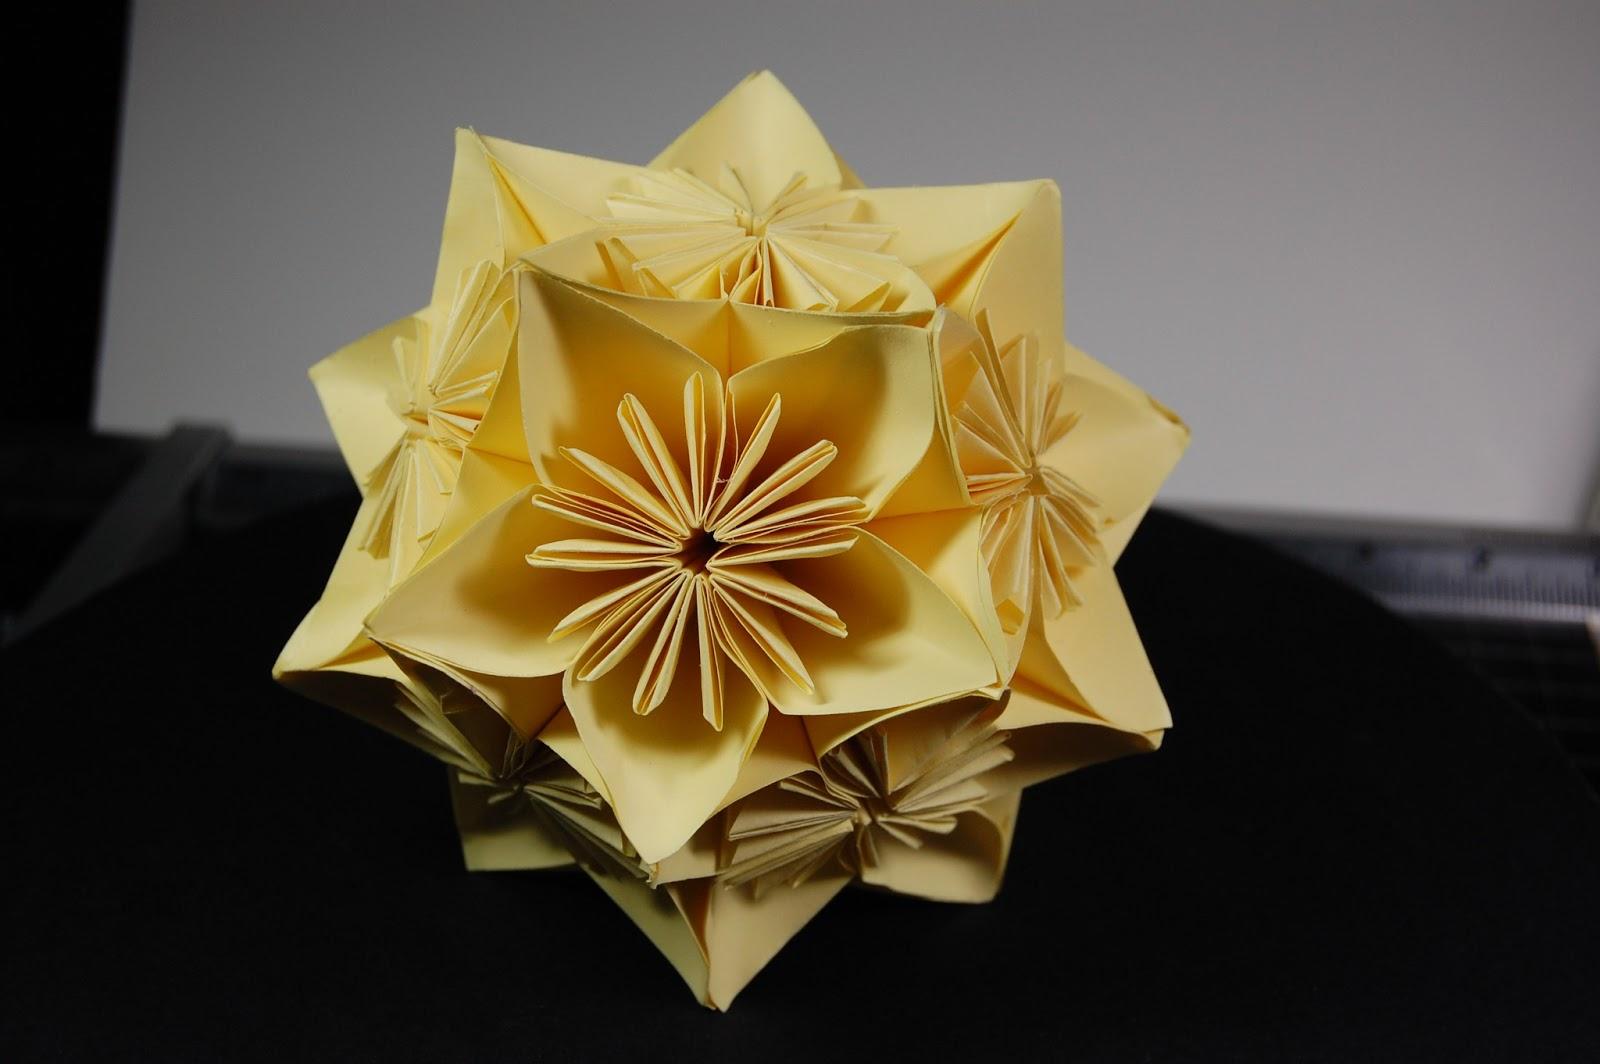 Sigis Wild Tails And Creations Kusudama Origami Flower Ball